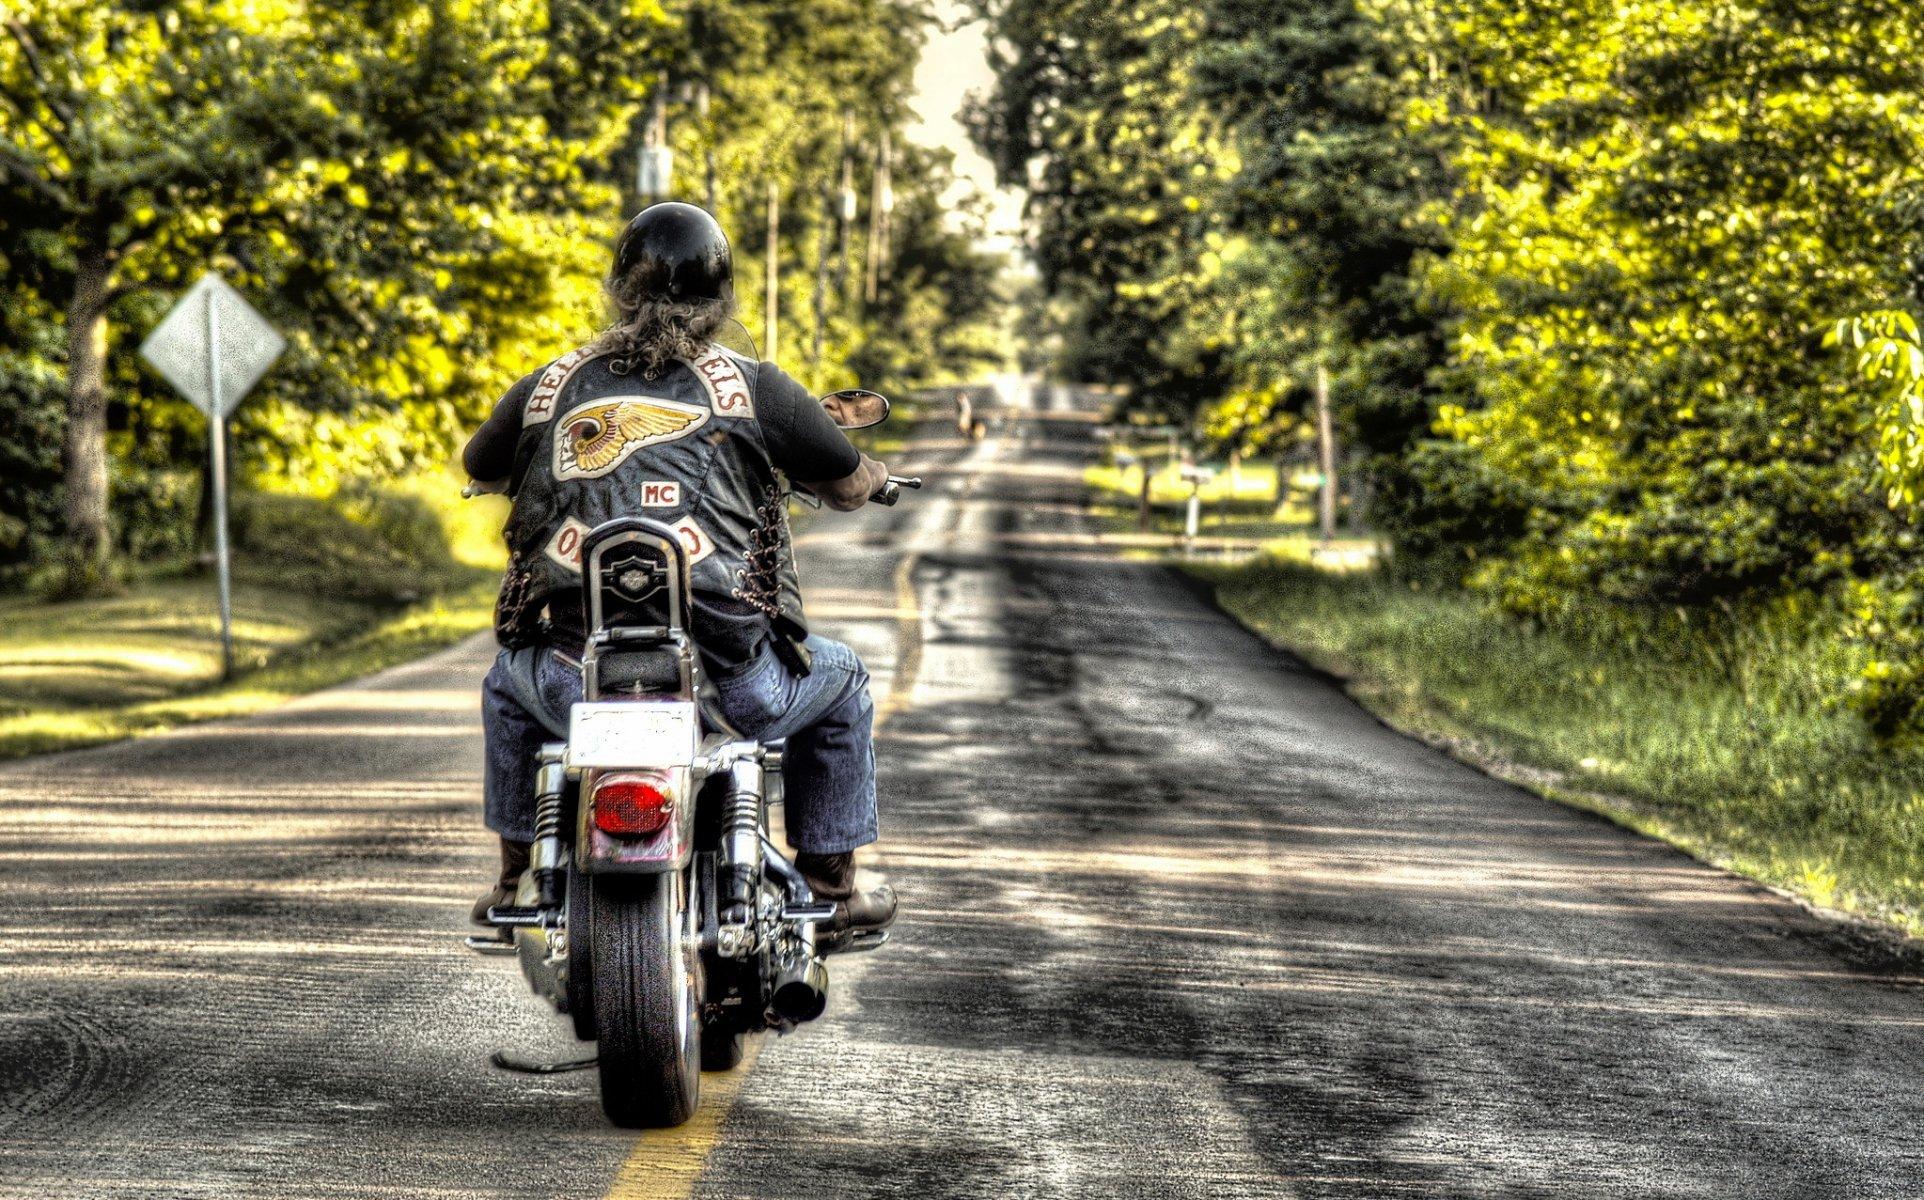 картинки мотоциклист на дороге говорить стилягах